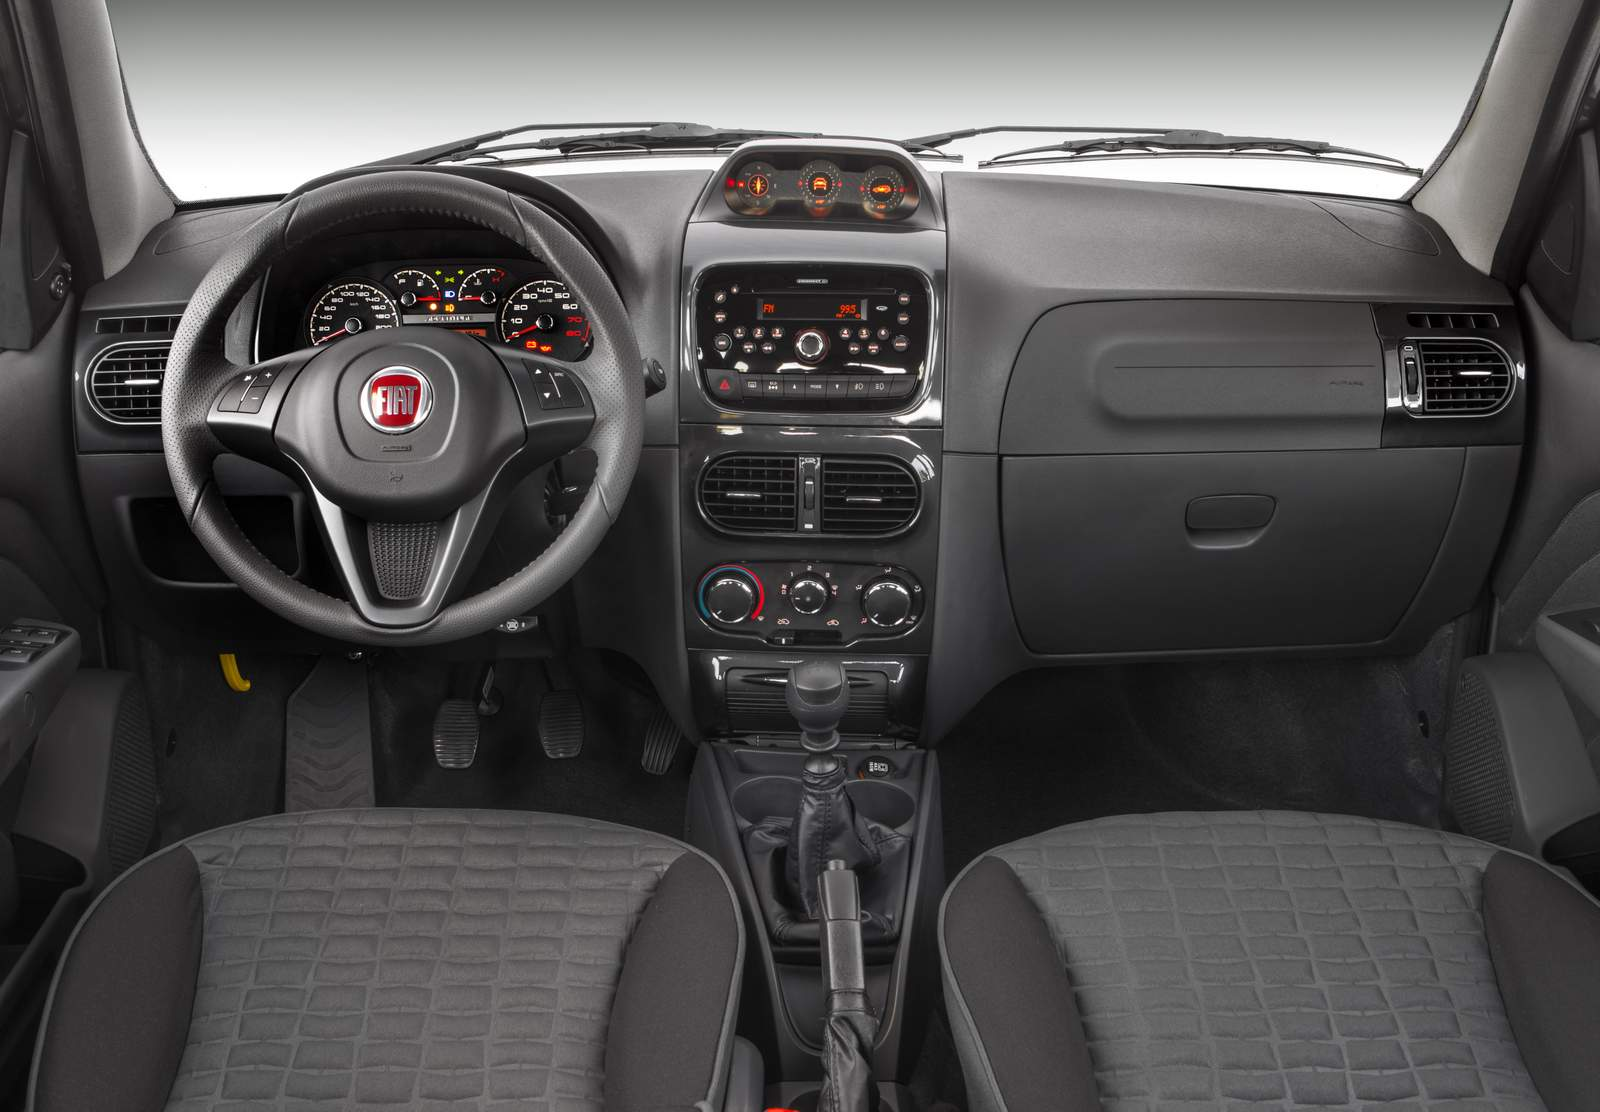 Fiat palio weekend 2015 pre os consumo e especifica es for Fiat idea adventure locker 2015